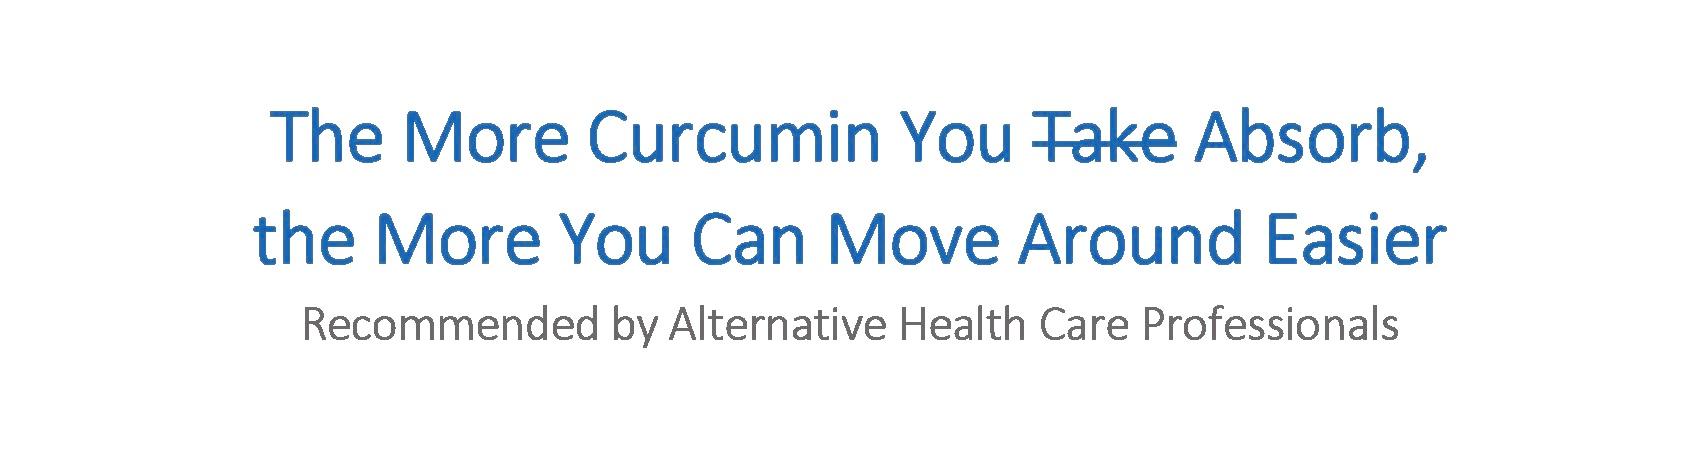 The+More+Curcumin+You+Take+Absorb.jpg